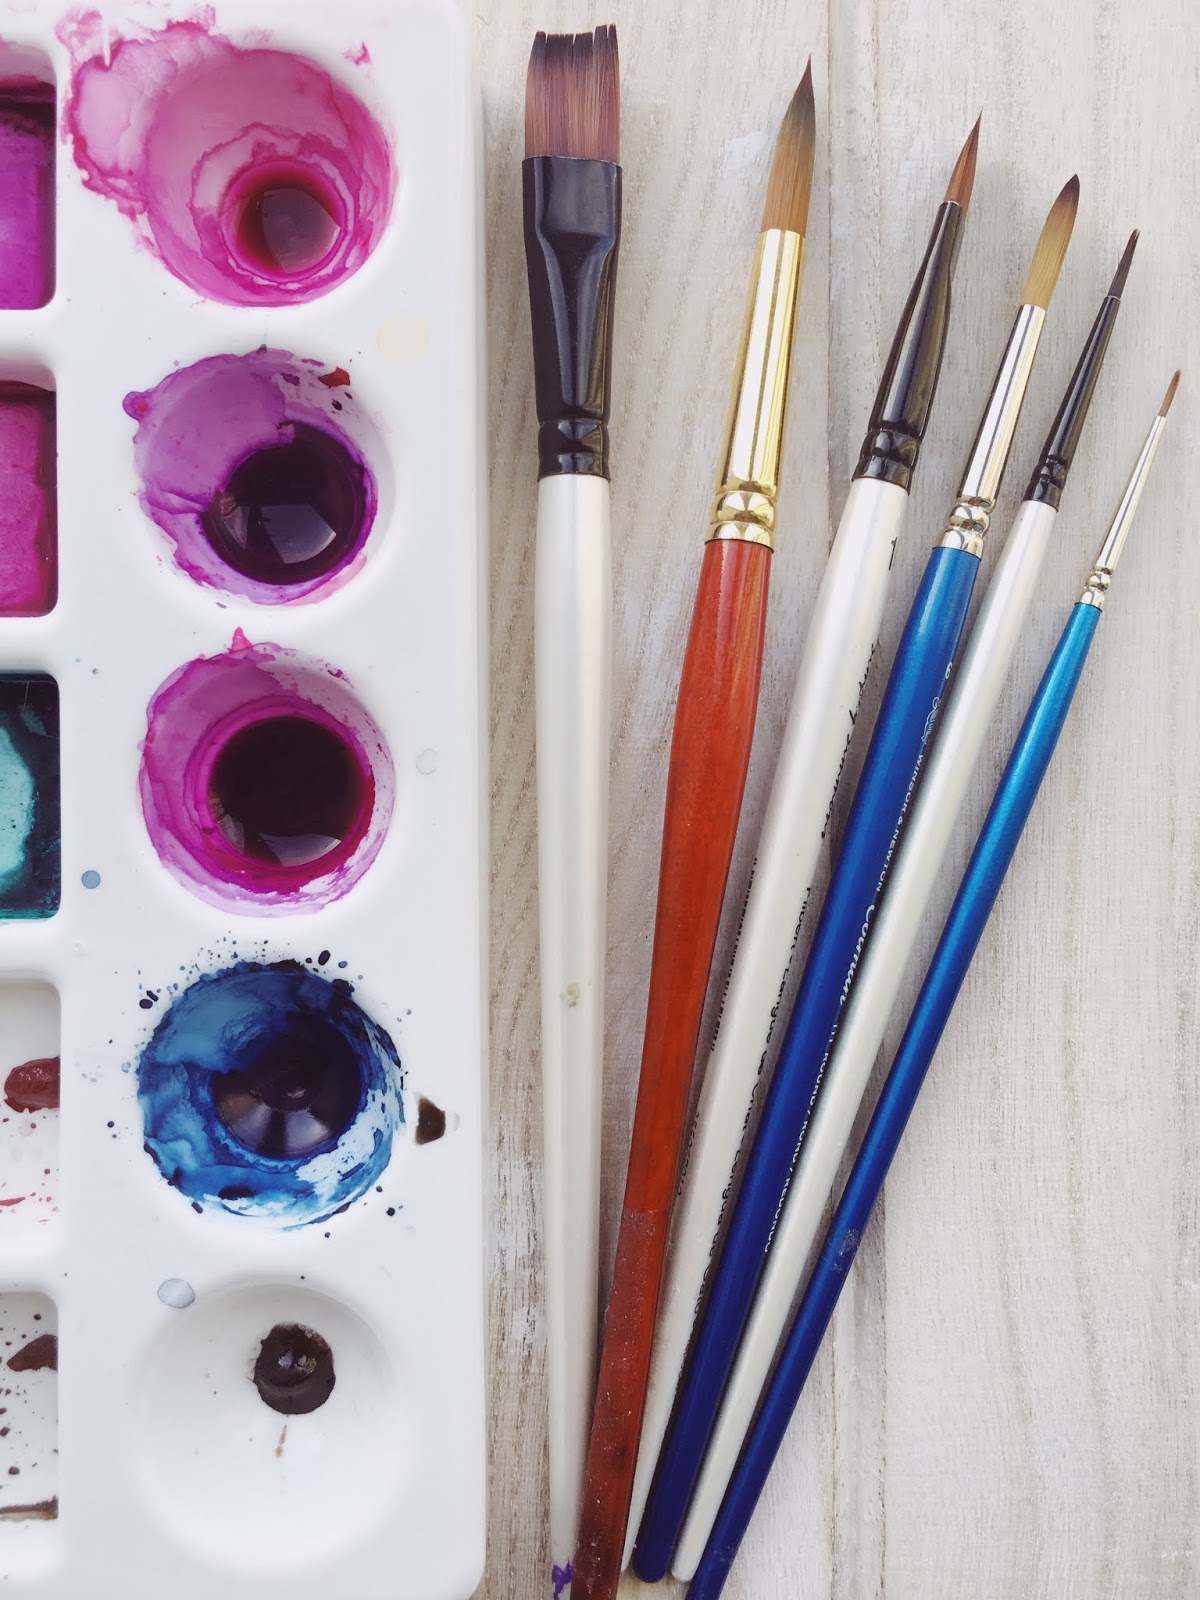 Brushes - Watercolor Brushes - Watercolor Tips - Art Blog - theartsyboho.com